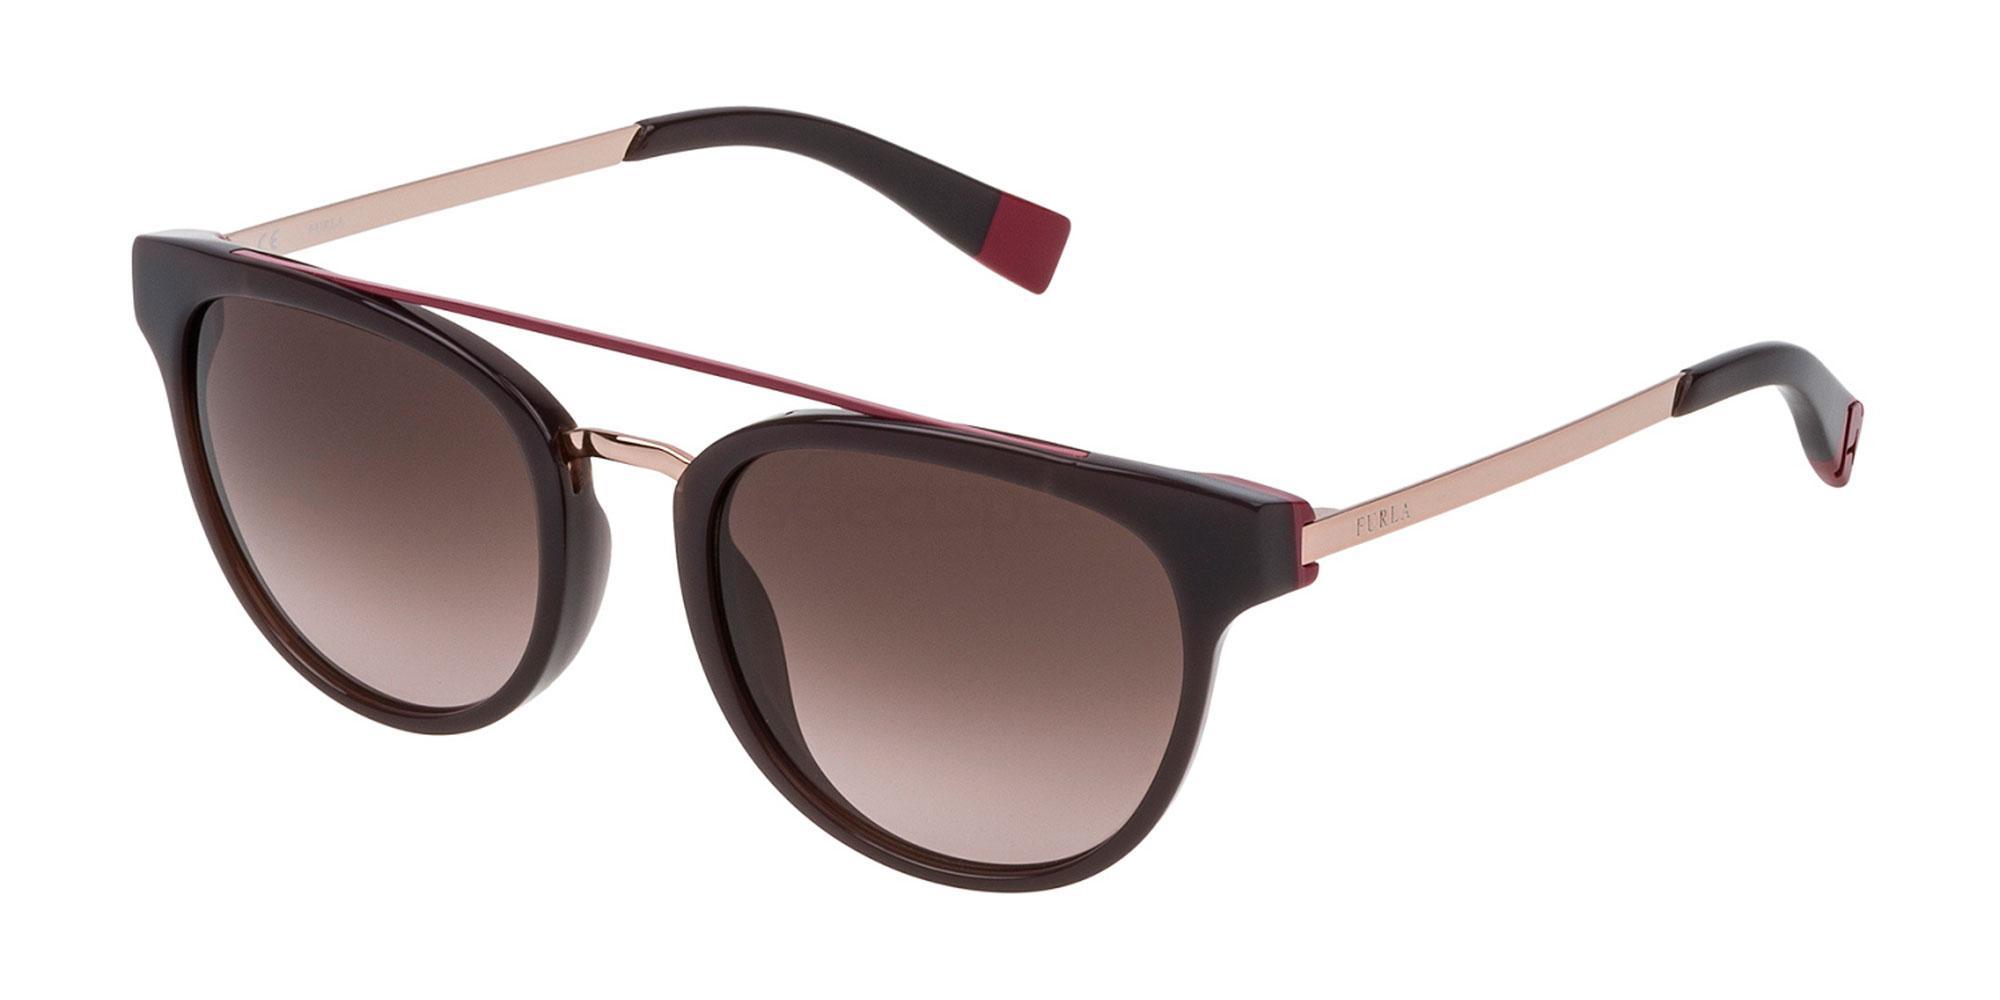 06XM SFU044 Sunglasses, Furla